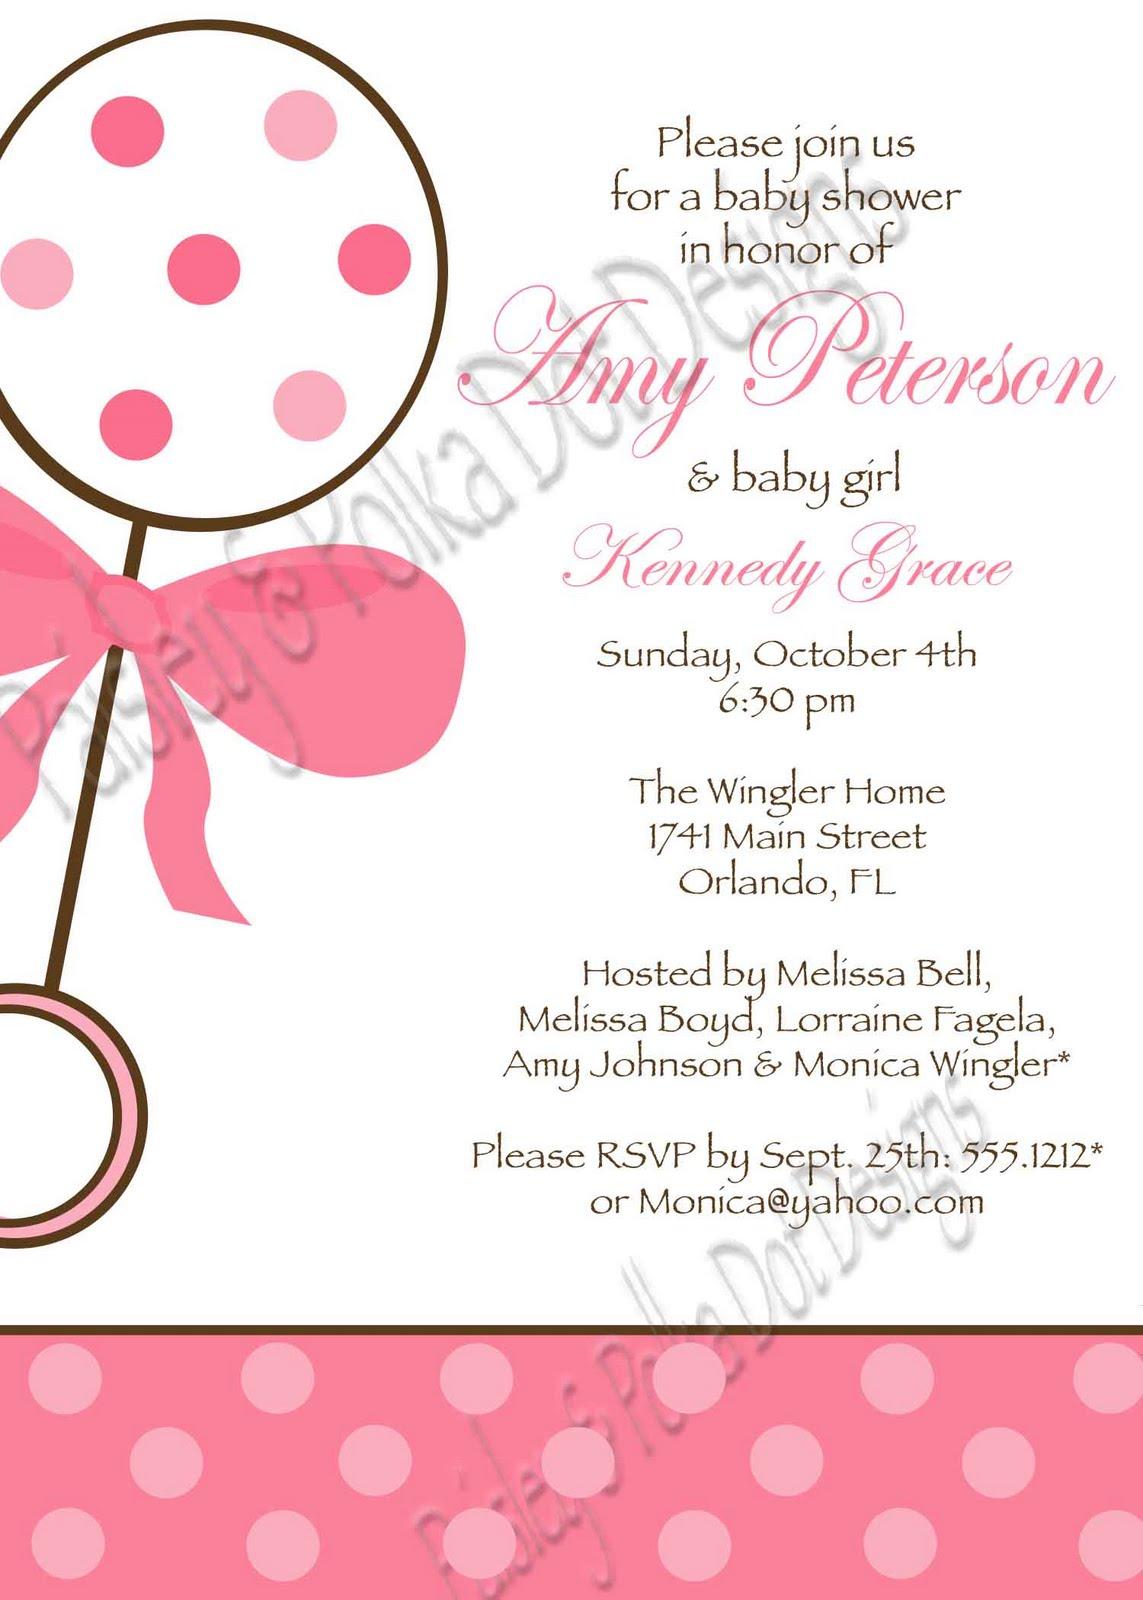 Paisley and Polka Dot Designs: Baby Shower Invitations